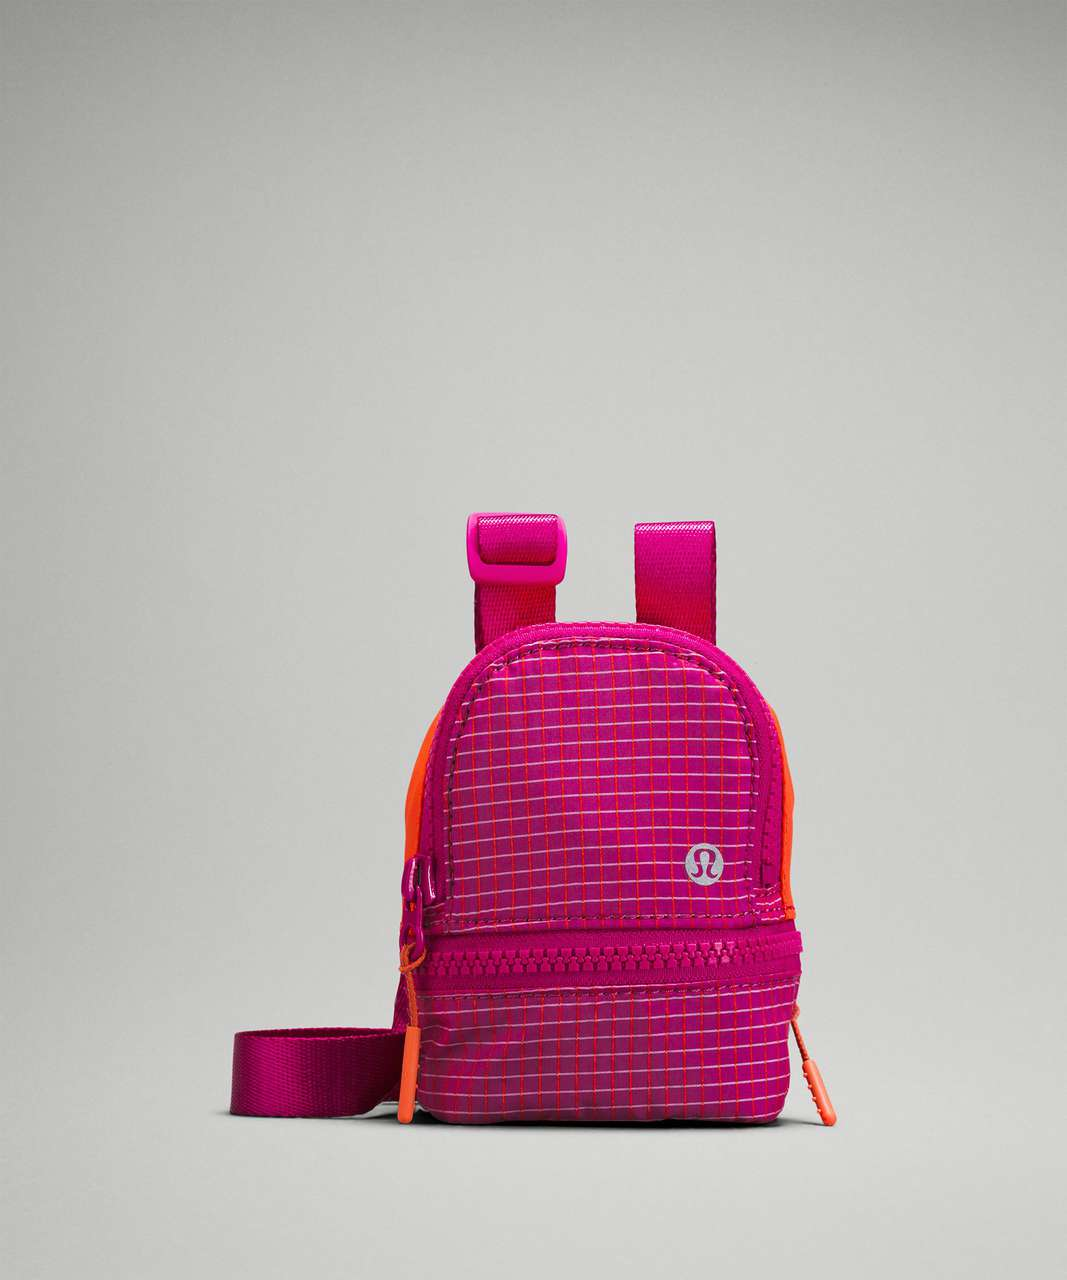 Lululemon City Adventurer Nano Crossbody Bag - Pink Lychee / Autumn Red / Ripened Raspberry